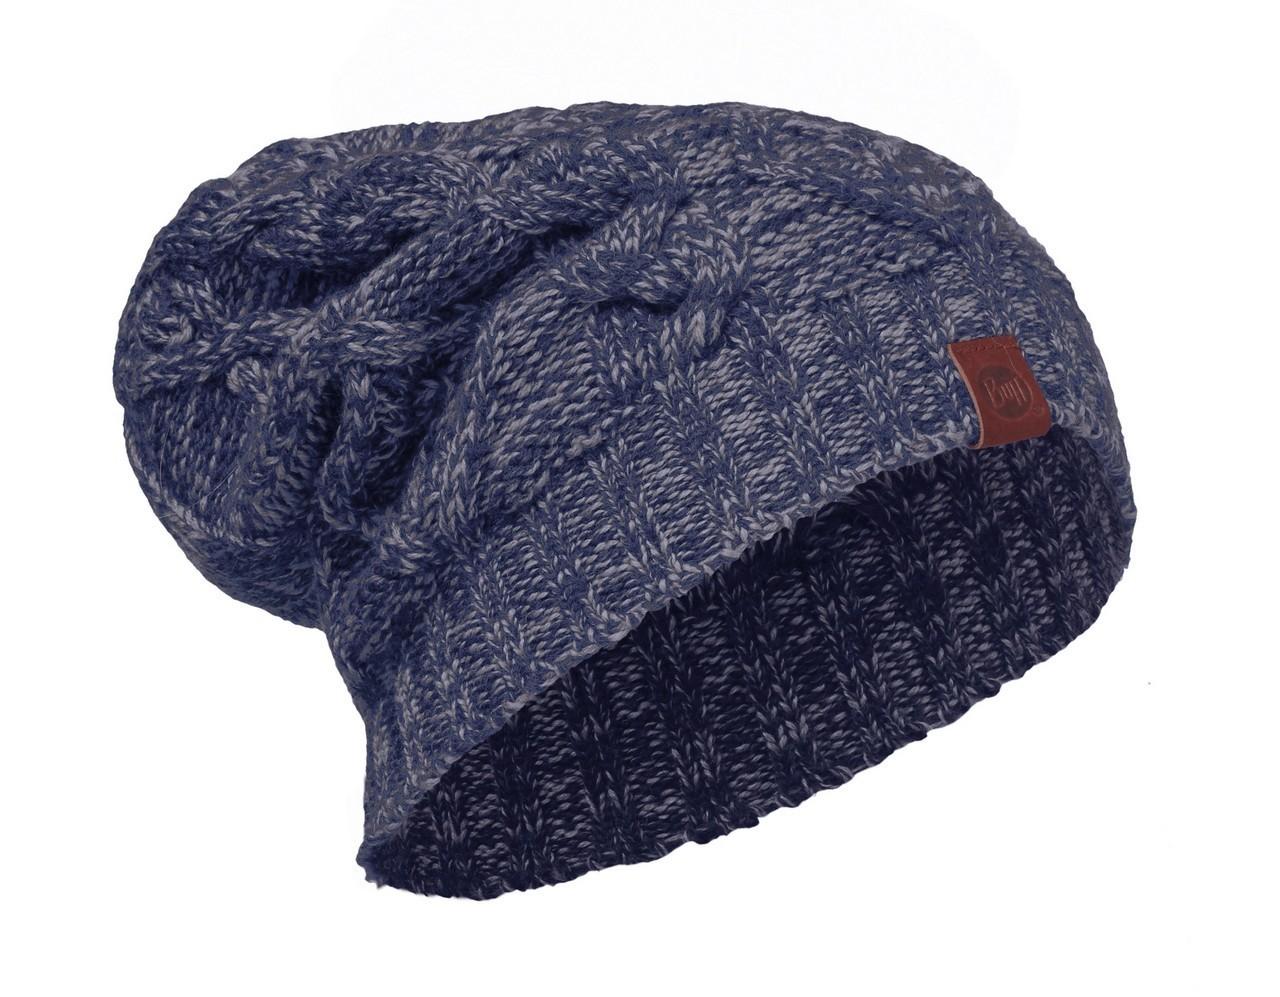 Шапки крупной вязки Вязаная шапка Buff Nuba Medieval Blue 2008.783.10.jpg